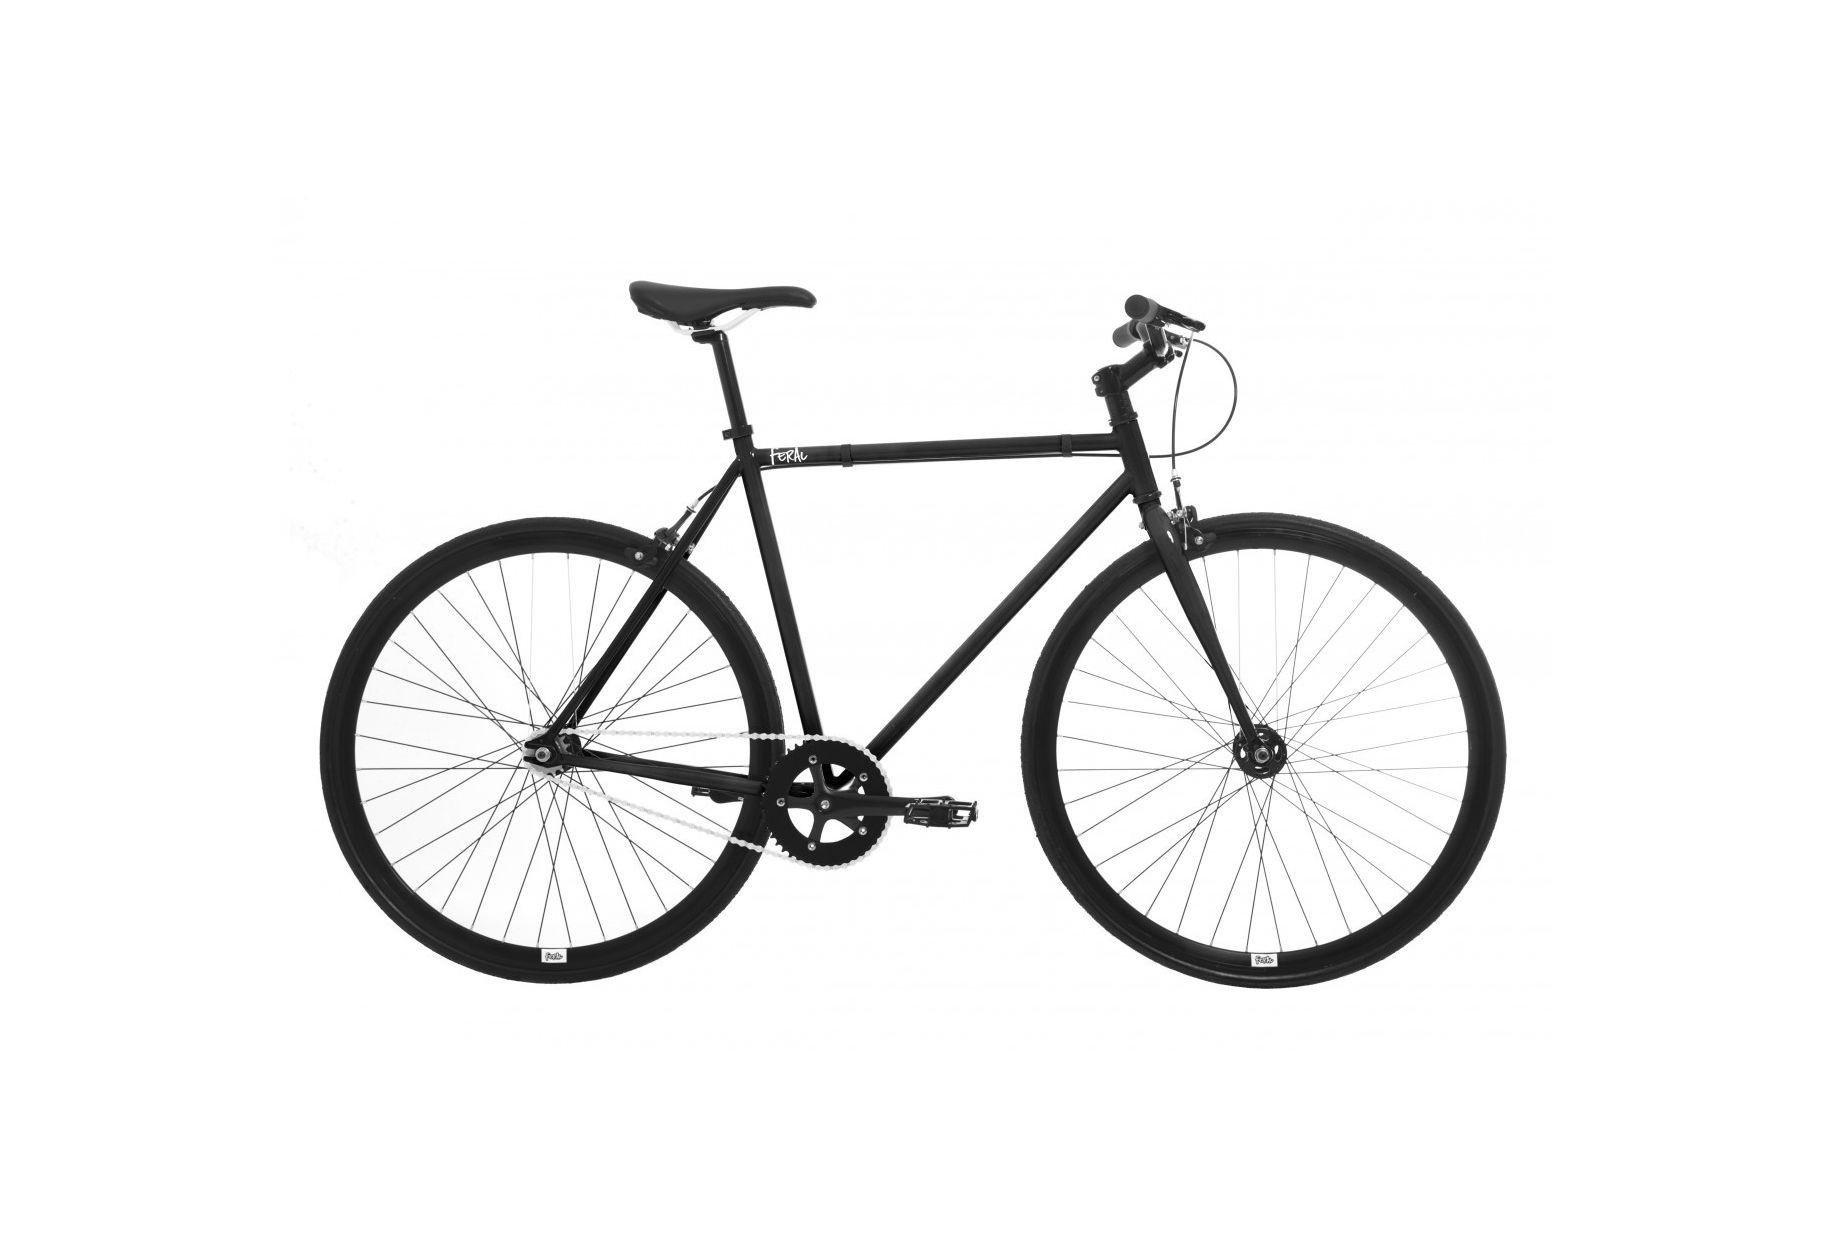 Image of Feral Fixie 55cm Frame Road Bike Black - Men's.